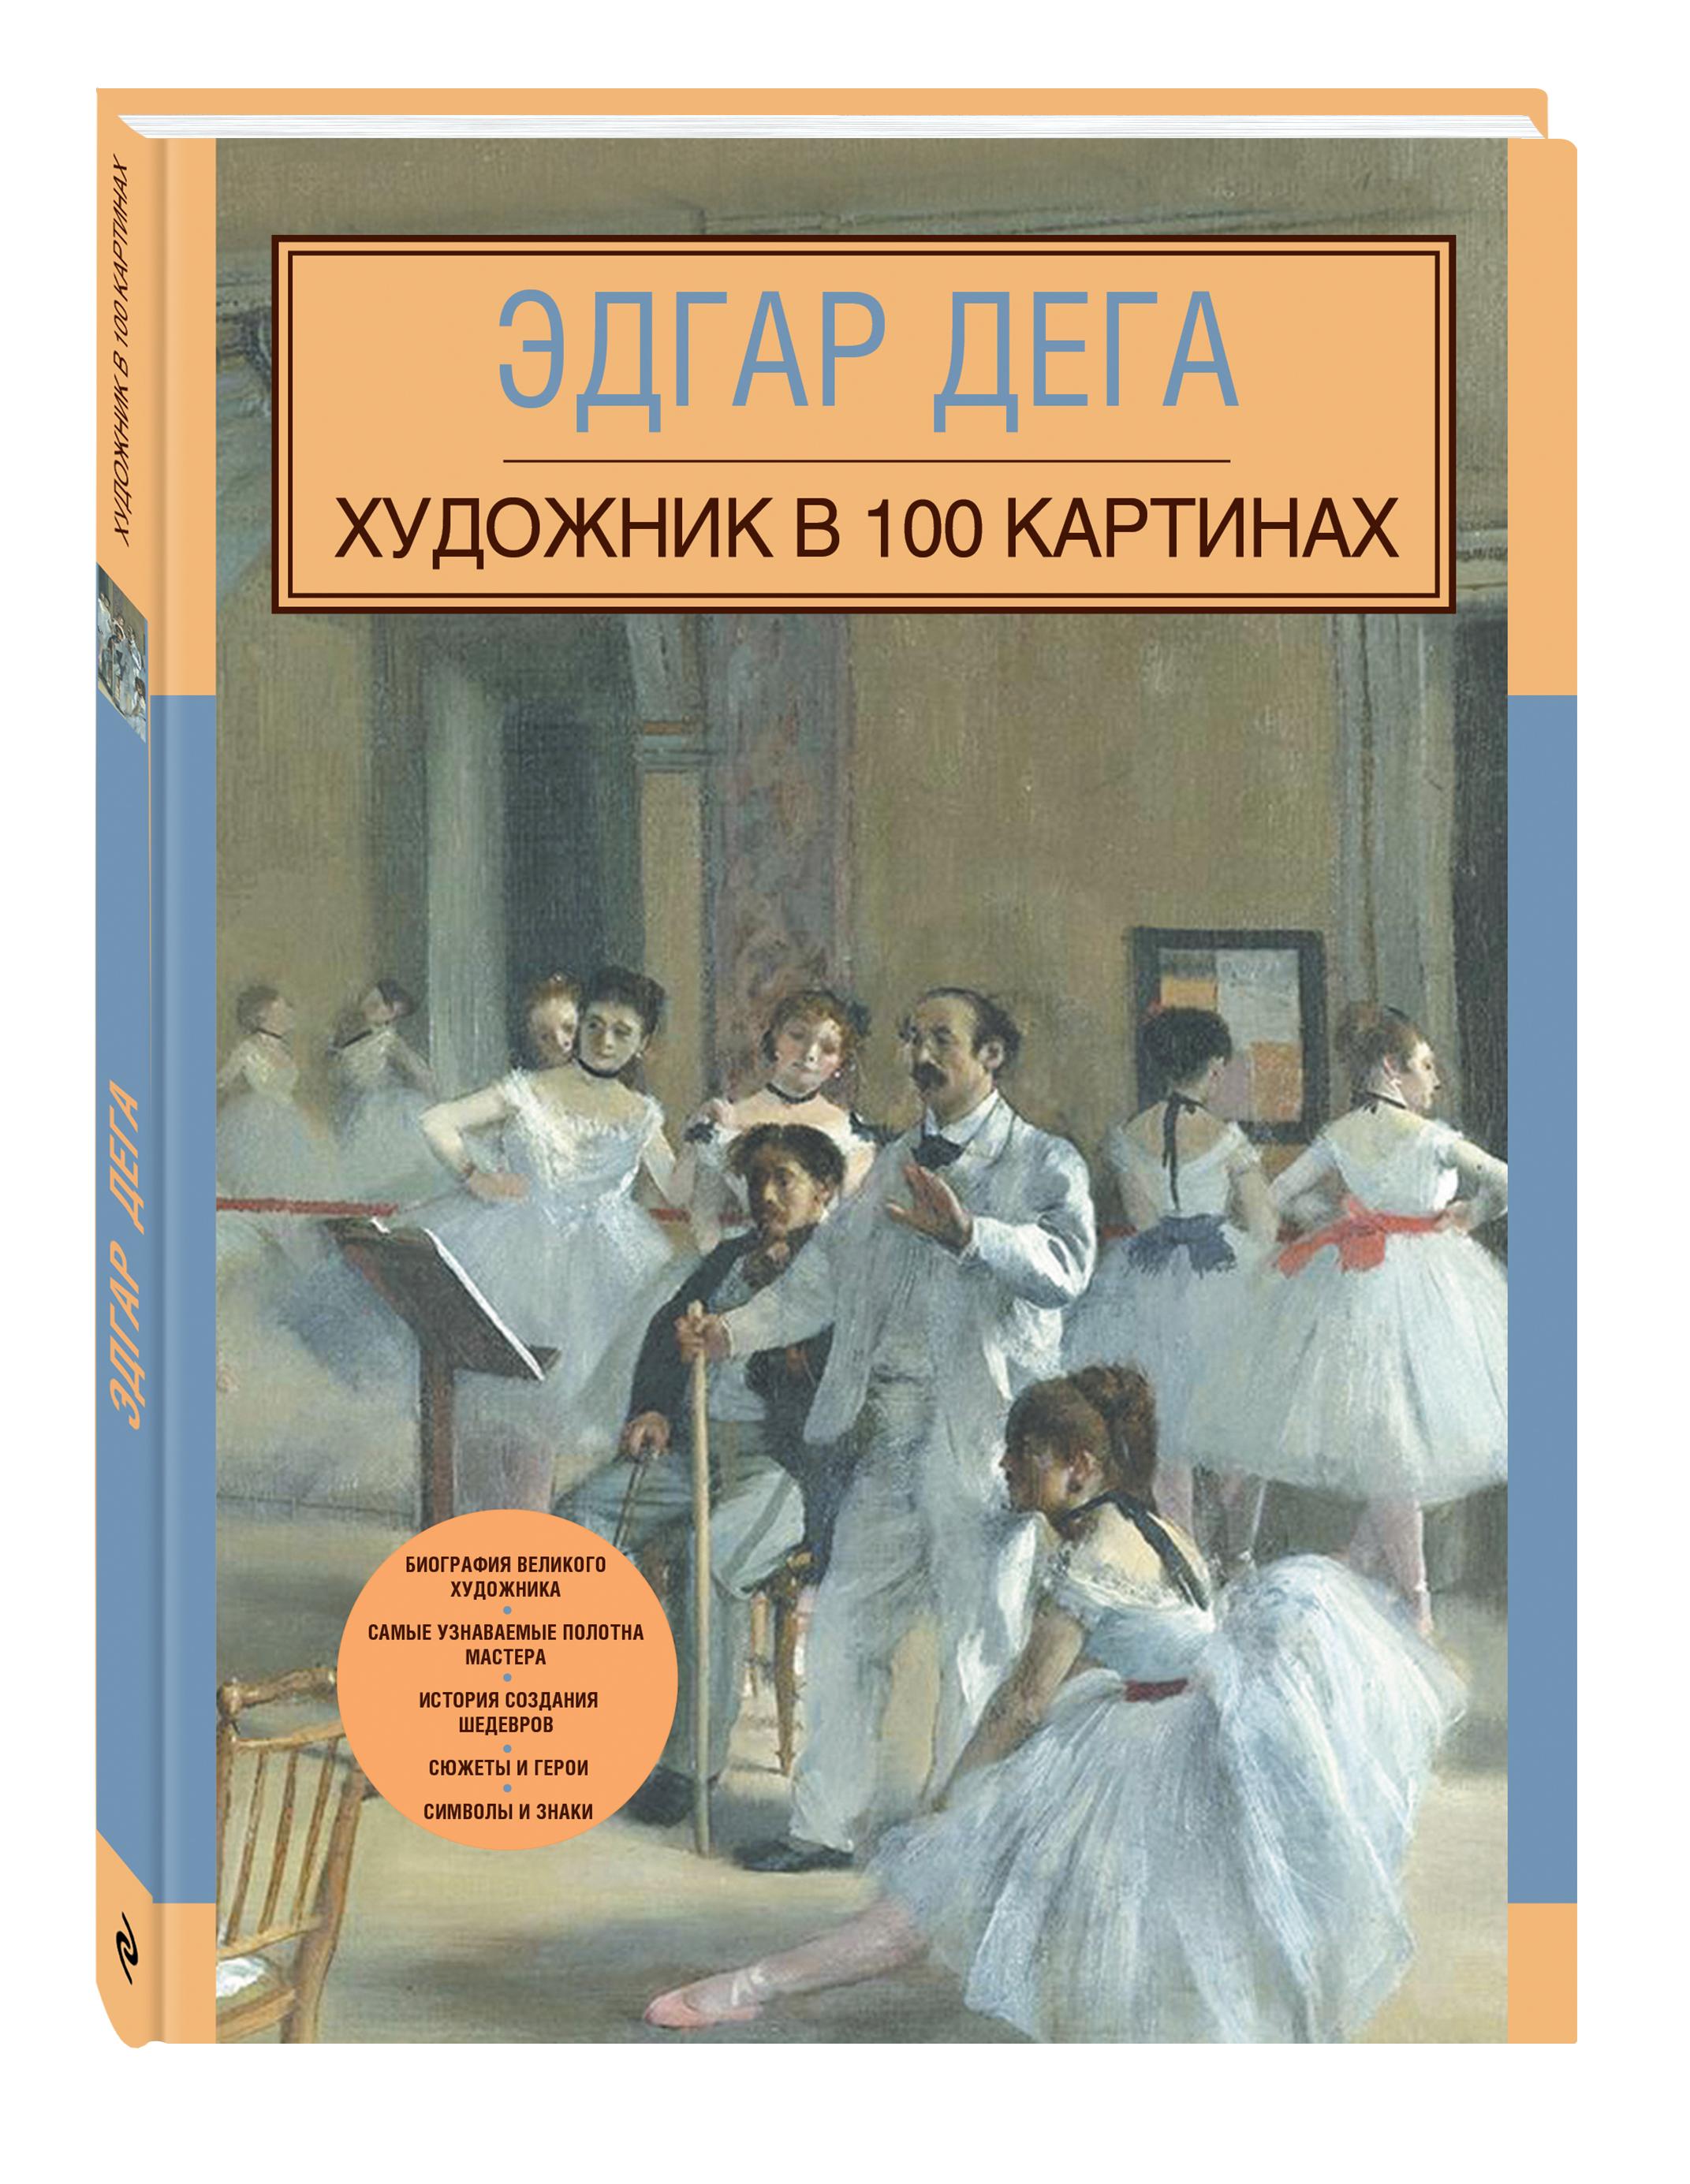 Эдгар Дега. Художник в 100 картинах от book24.ru